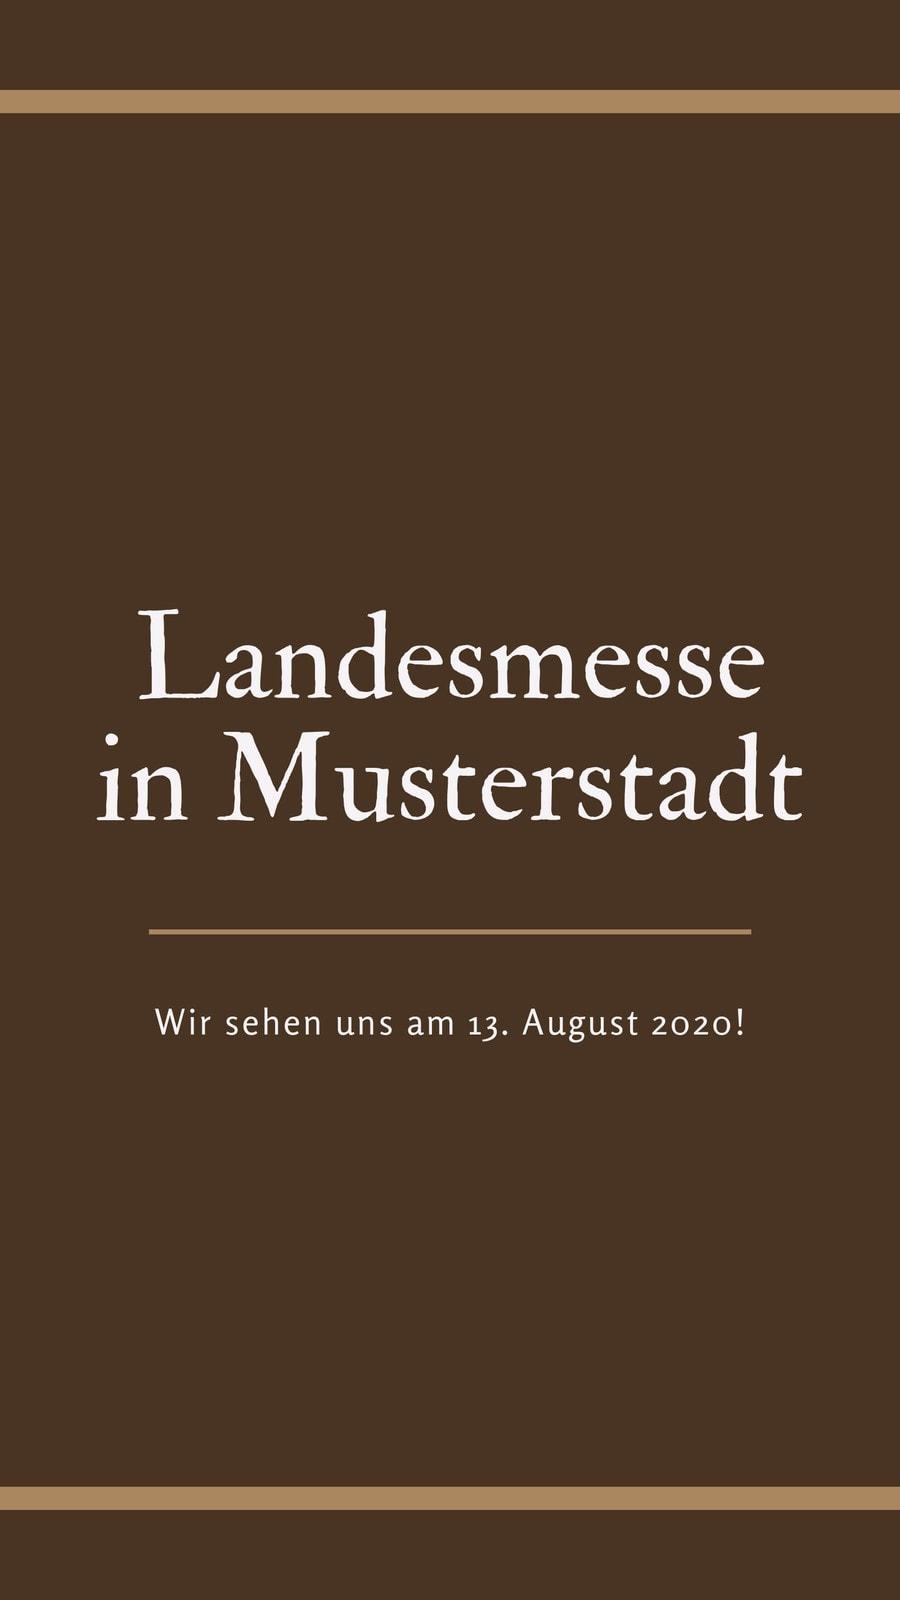 Sattel braun Rand Ingolstädter Landesmesse Story